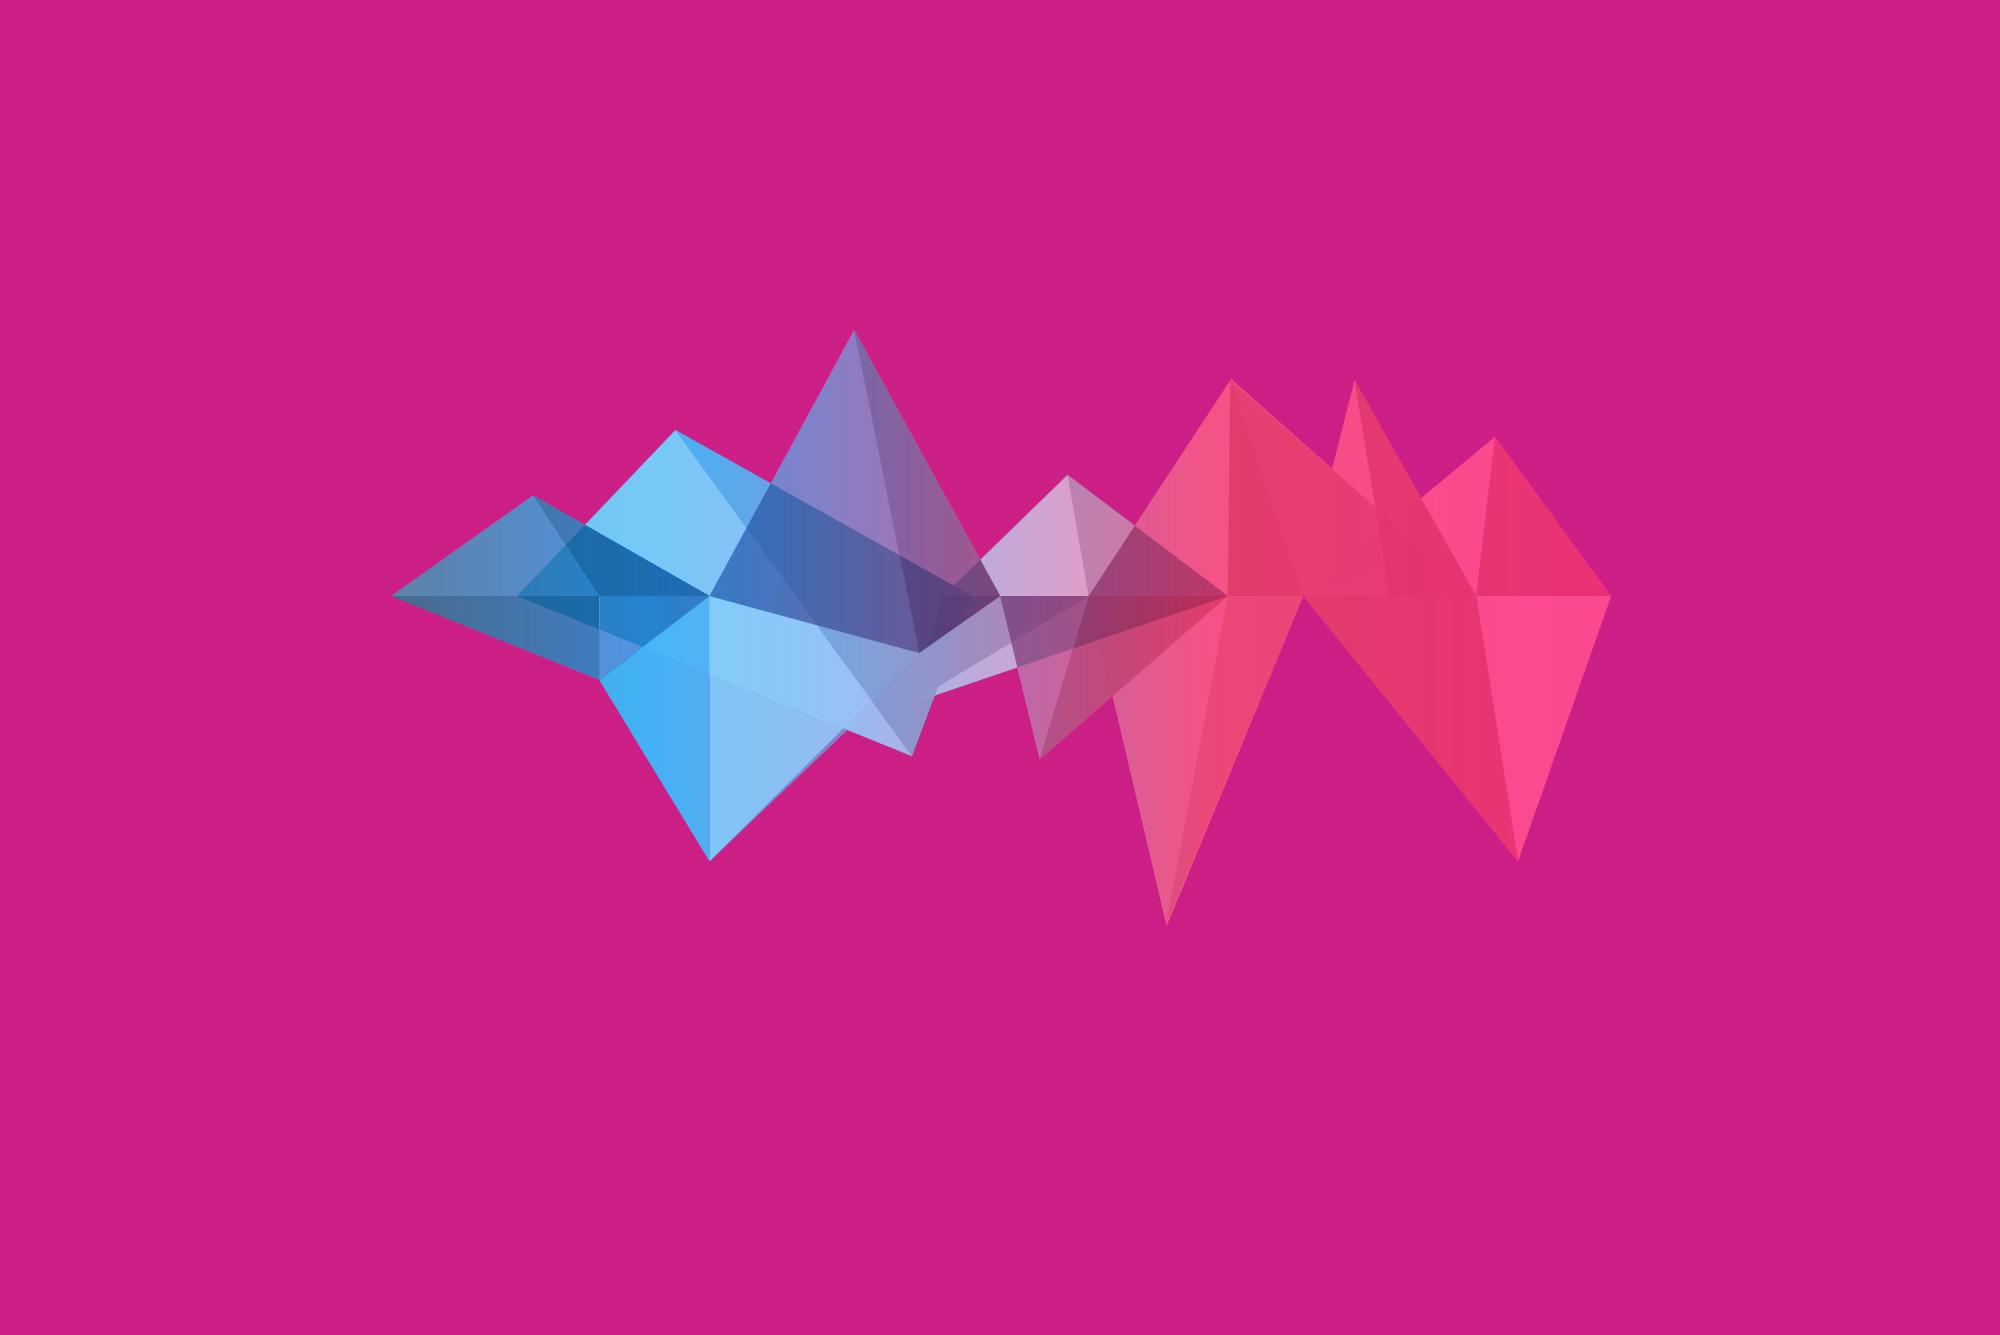 Pattern on pink background - SEO audit